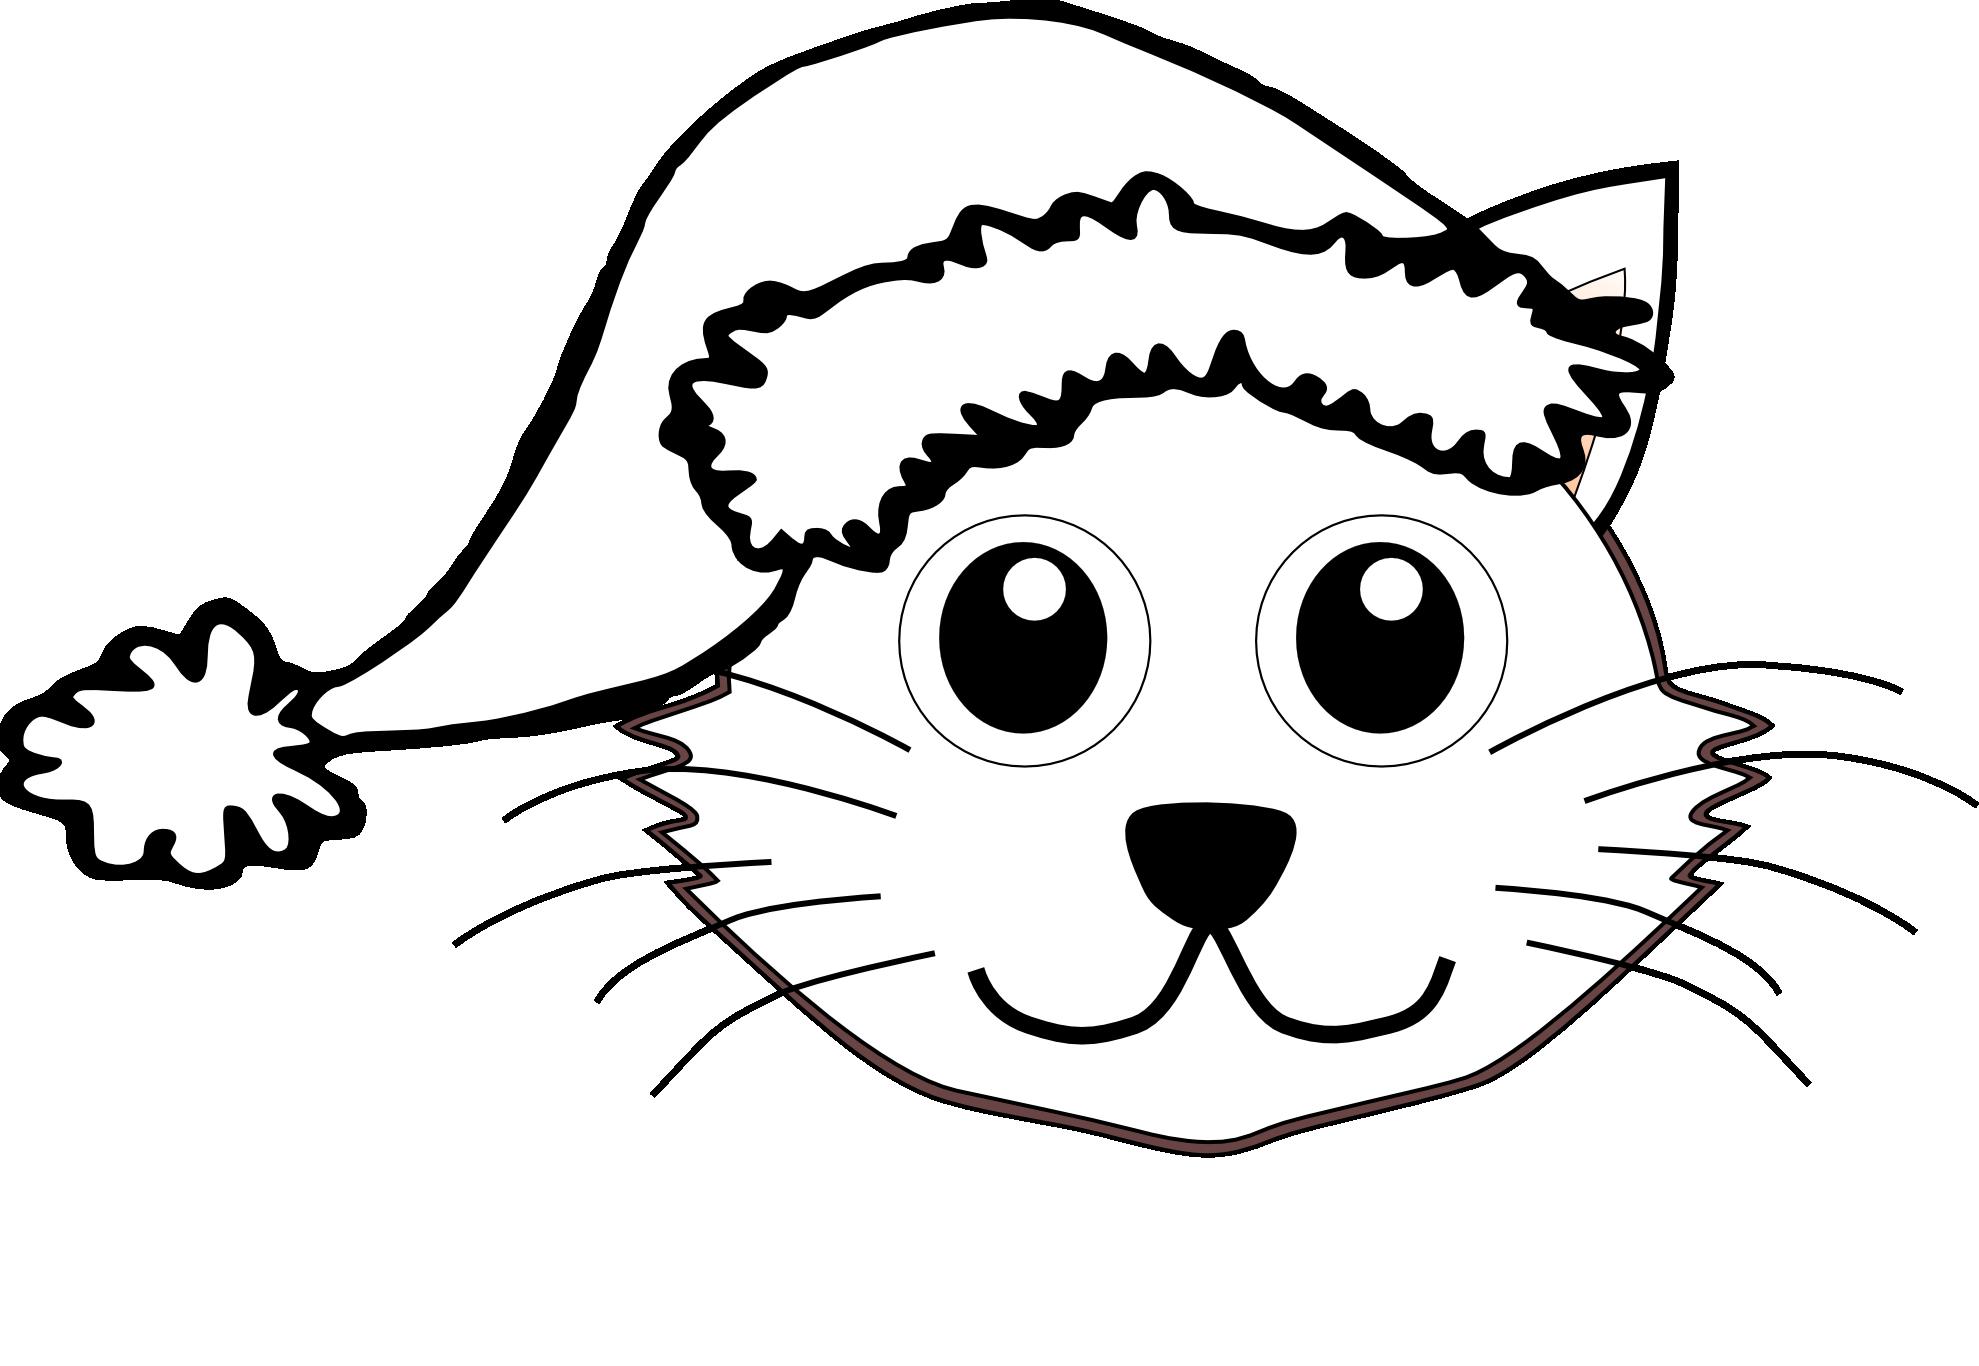 Exploring  Catclipart Org